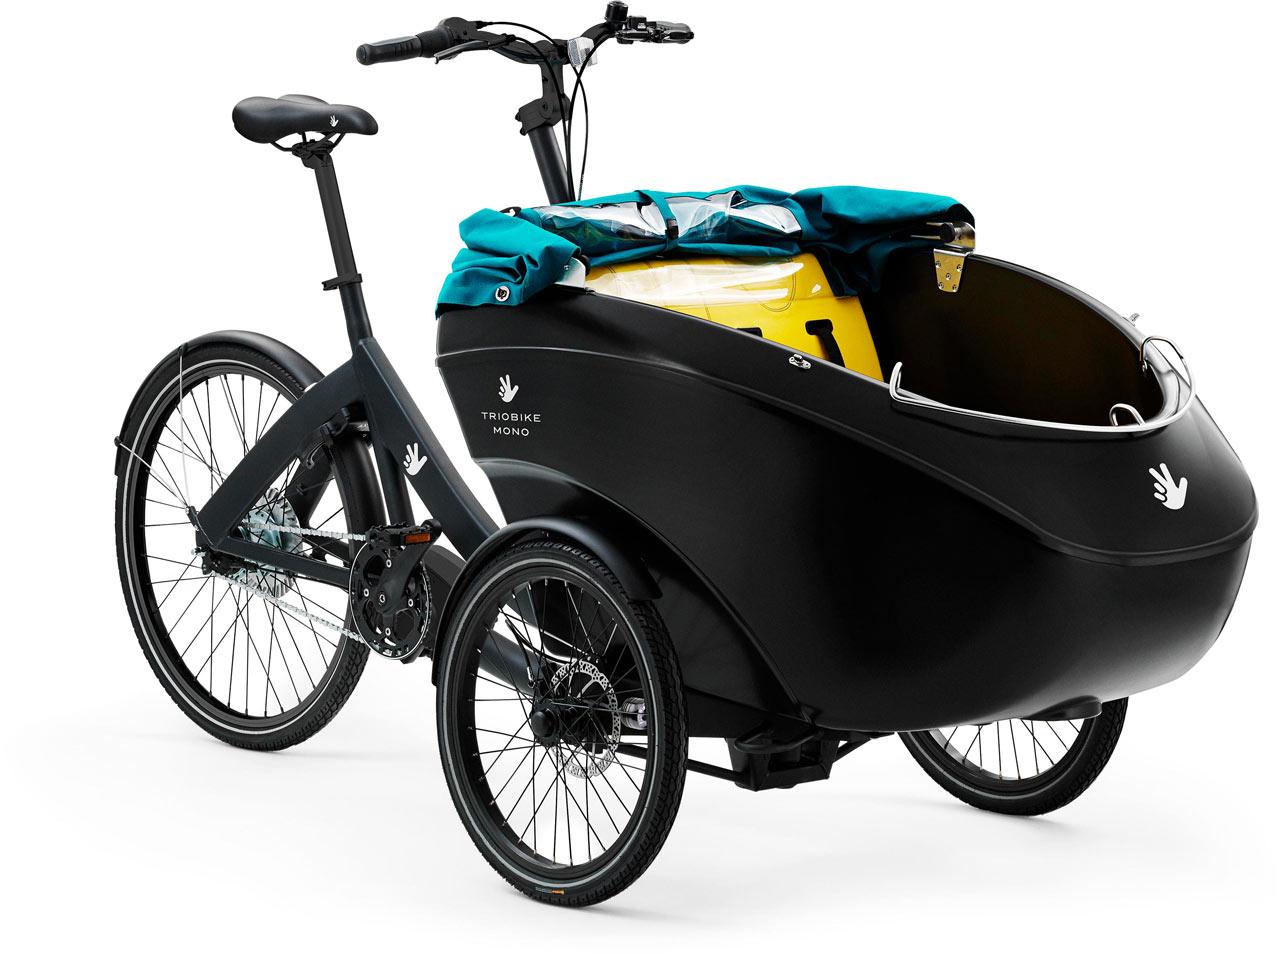 Triobike Mono E Nexus Lasten e-Bike / Cargo e-Bike 2020